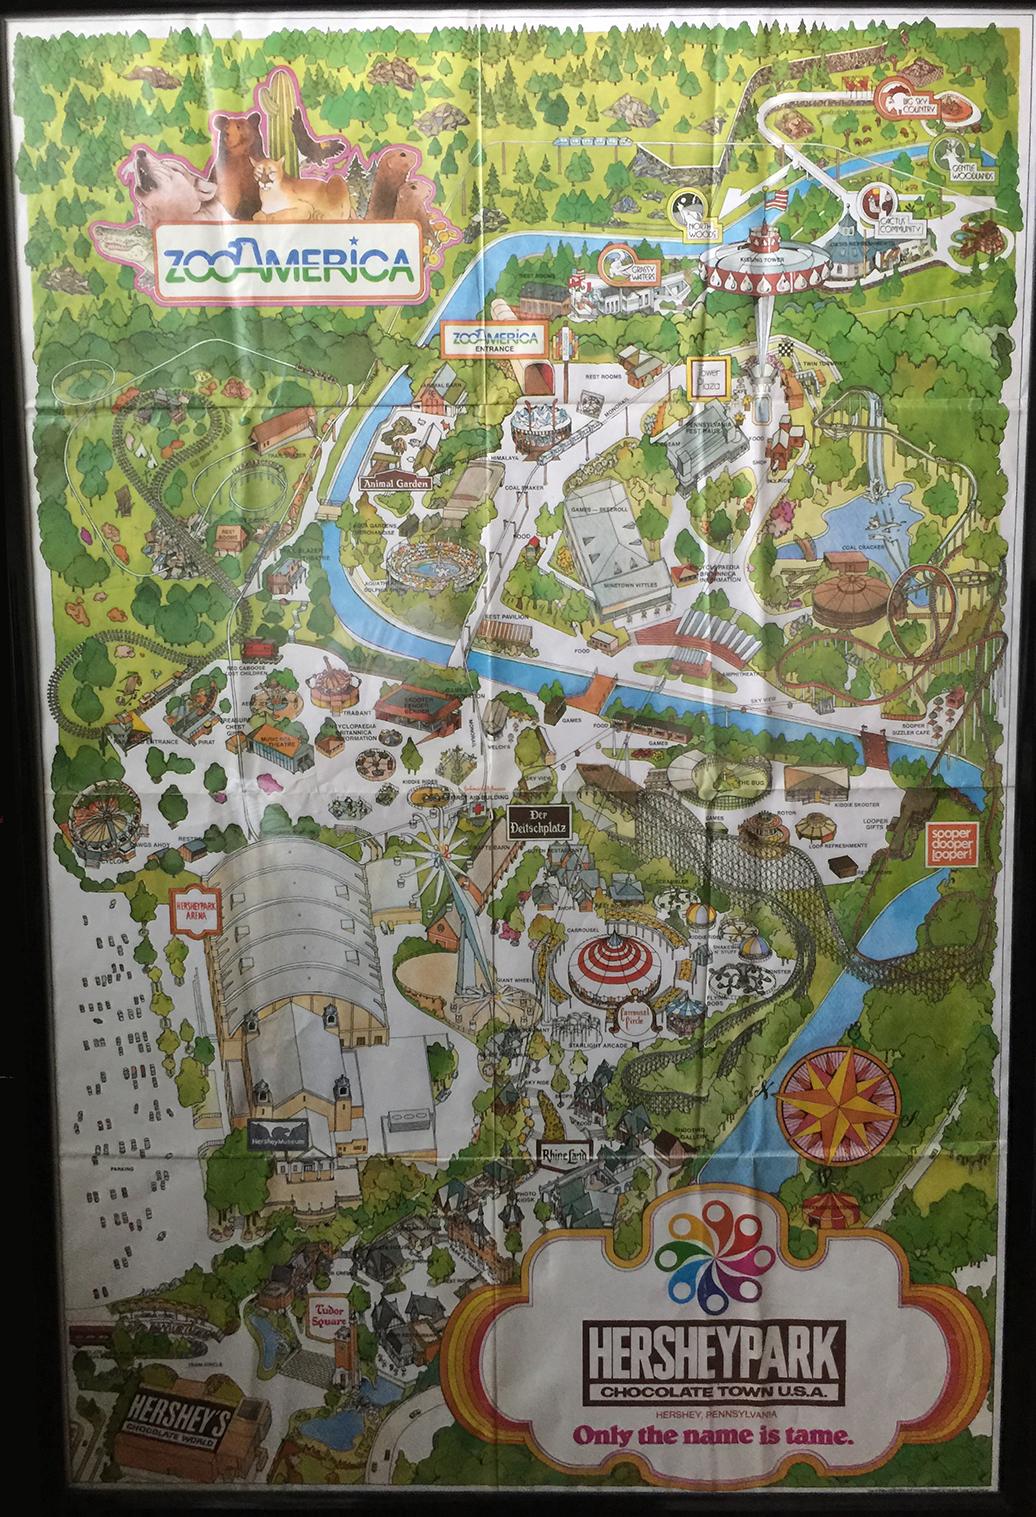 1980 Hersheypark Souvenir map